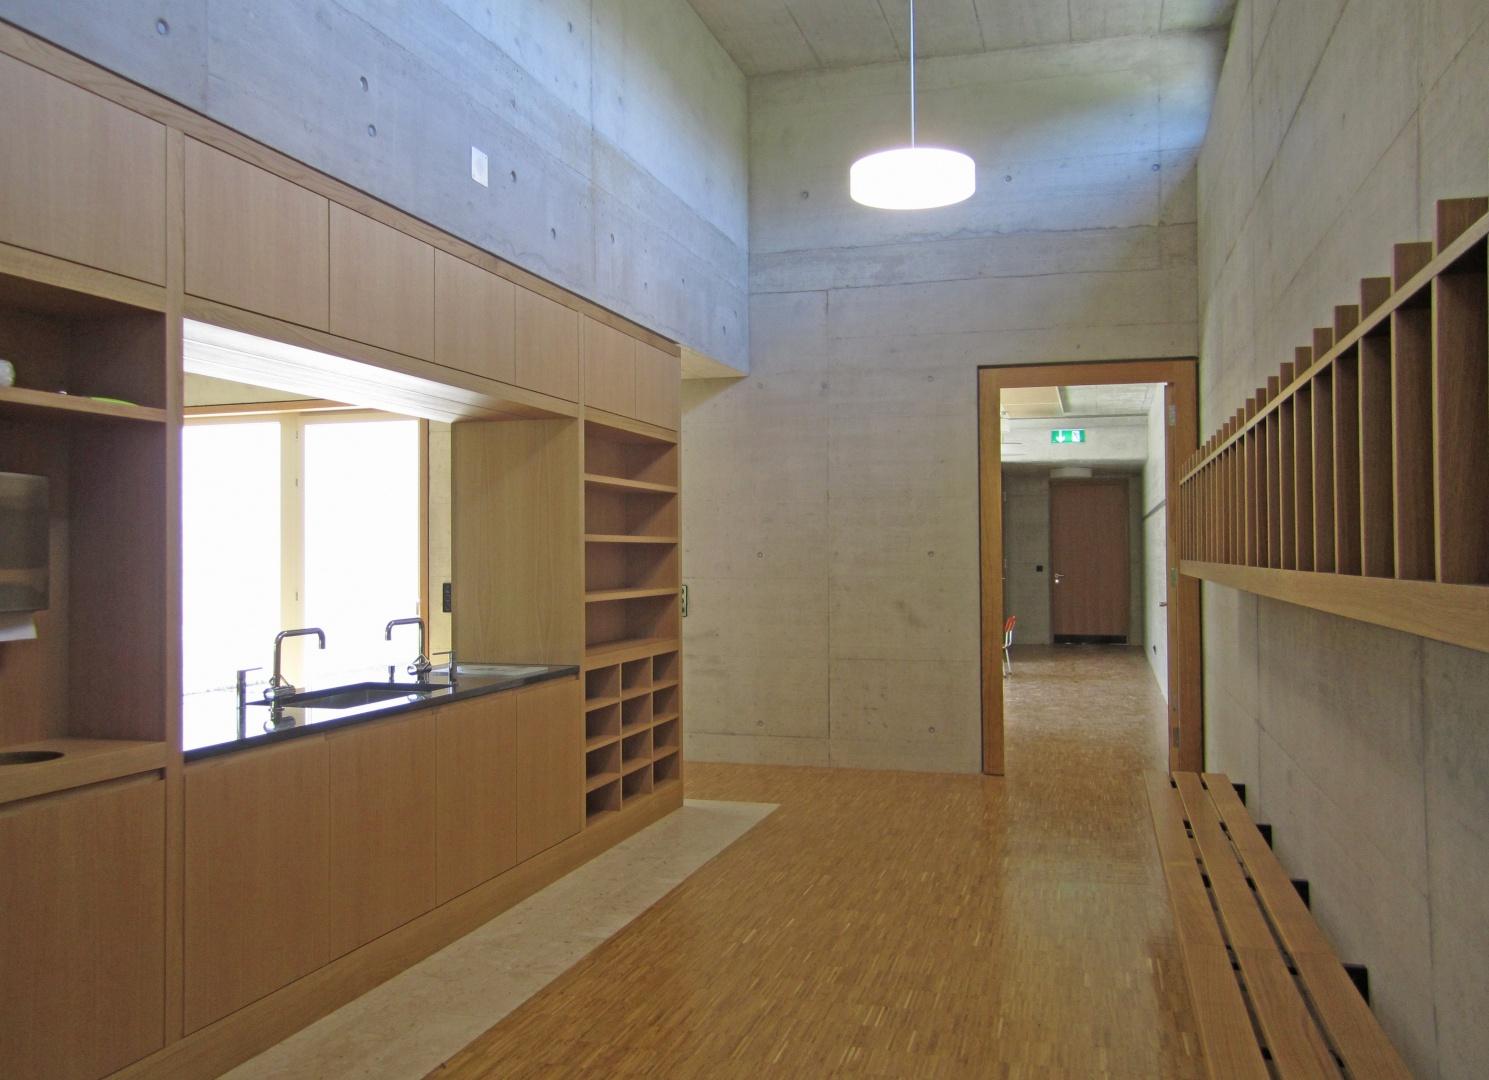 Garderobe Kindergarten © Hopf & Wirth Architekten, Rychenbergstrasse 2,  8400 Winterthur